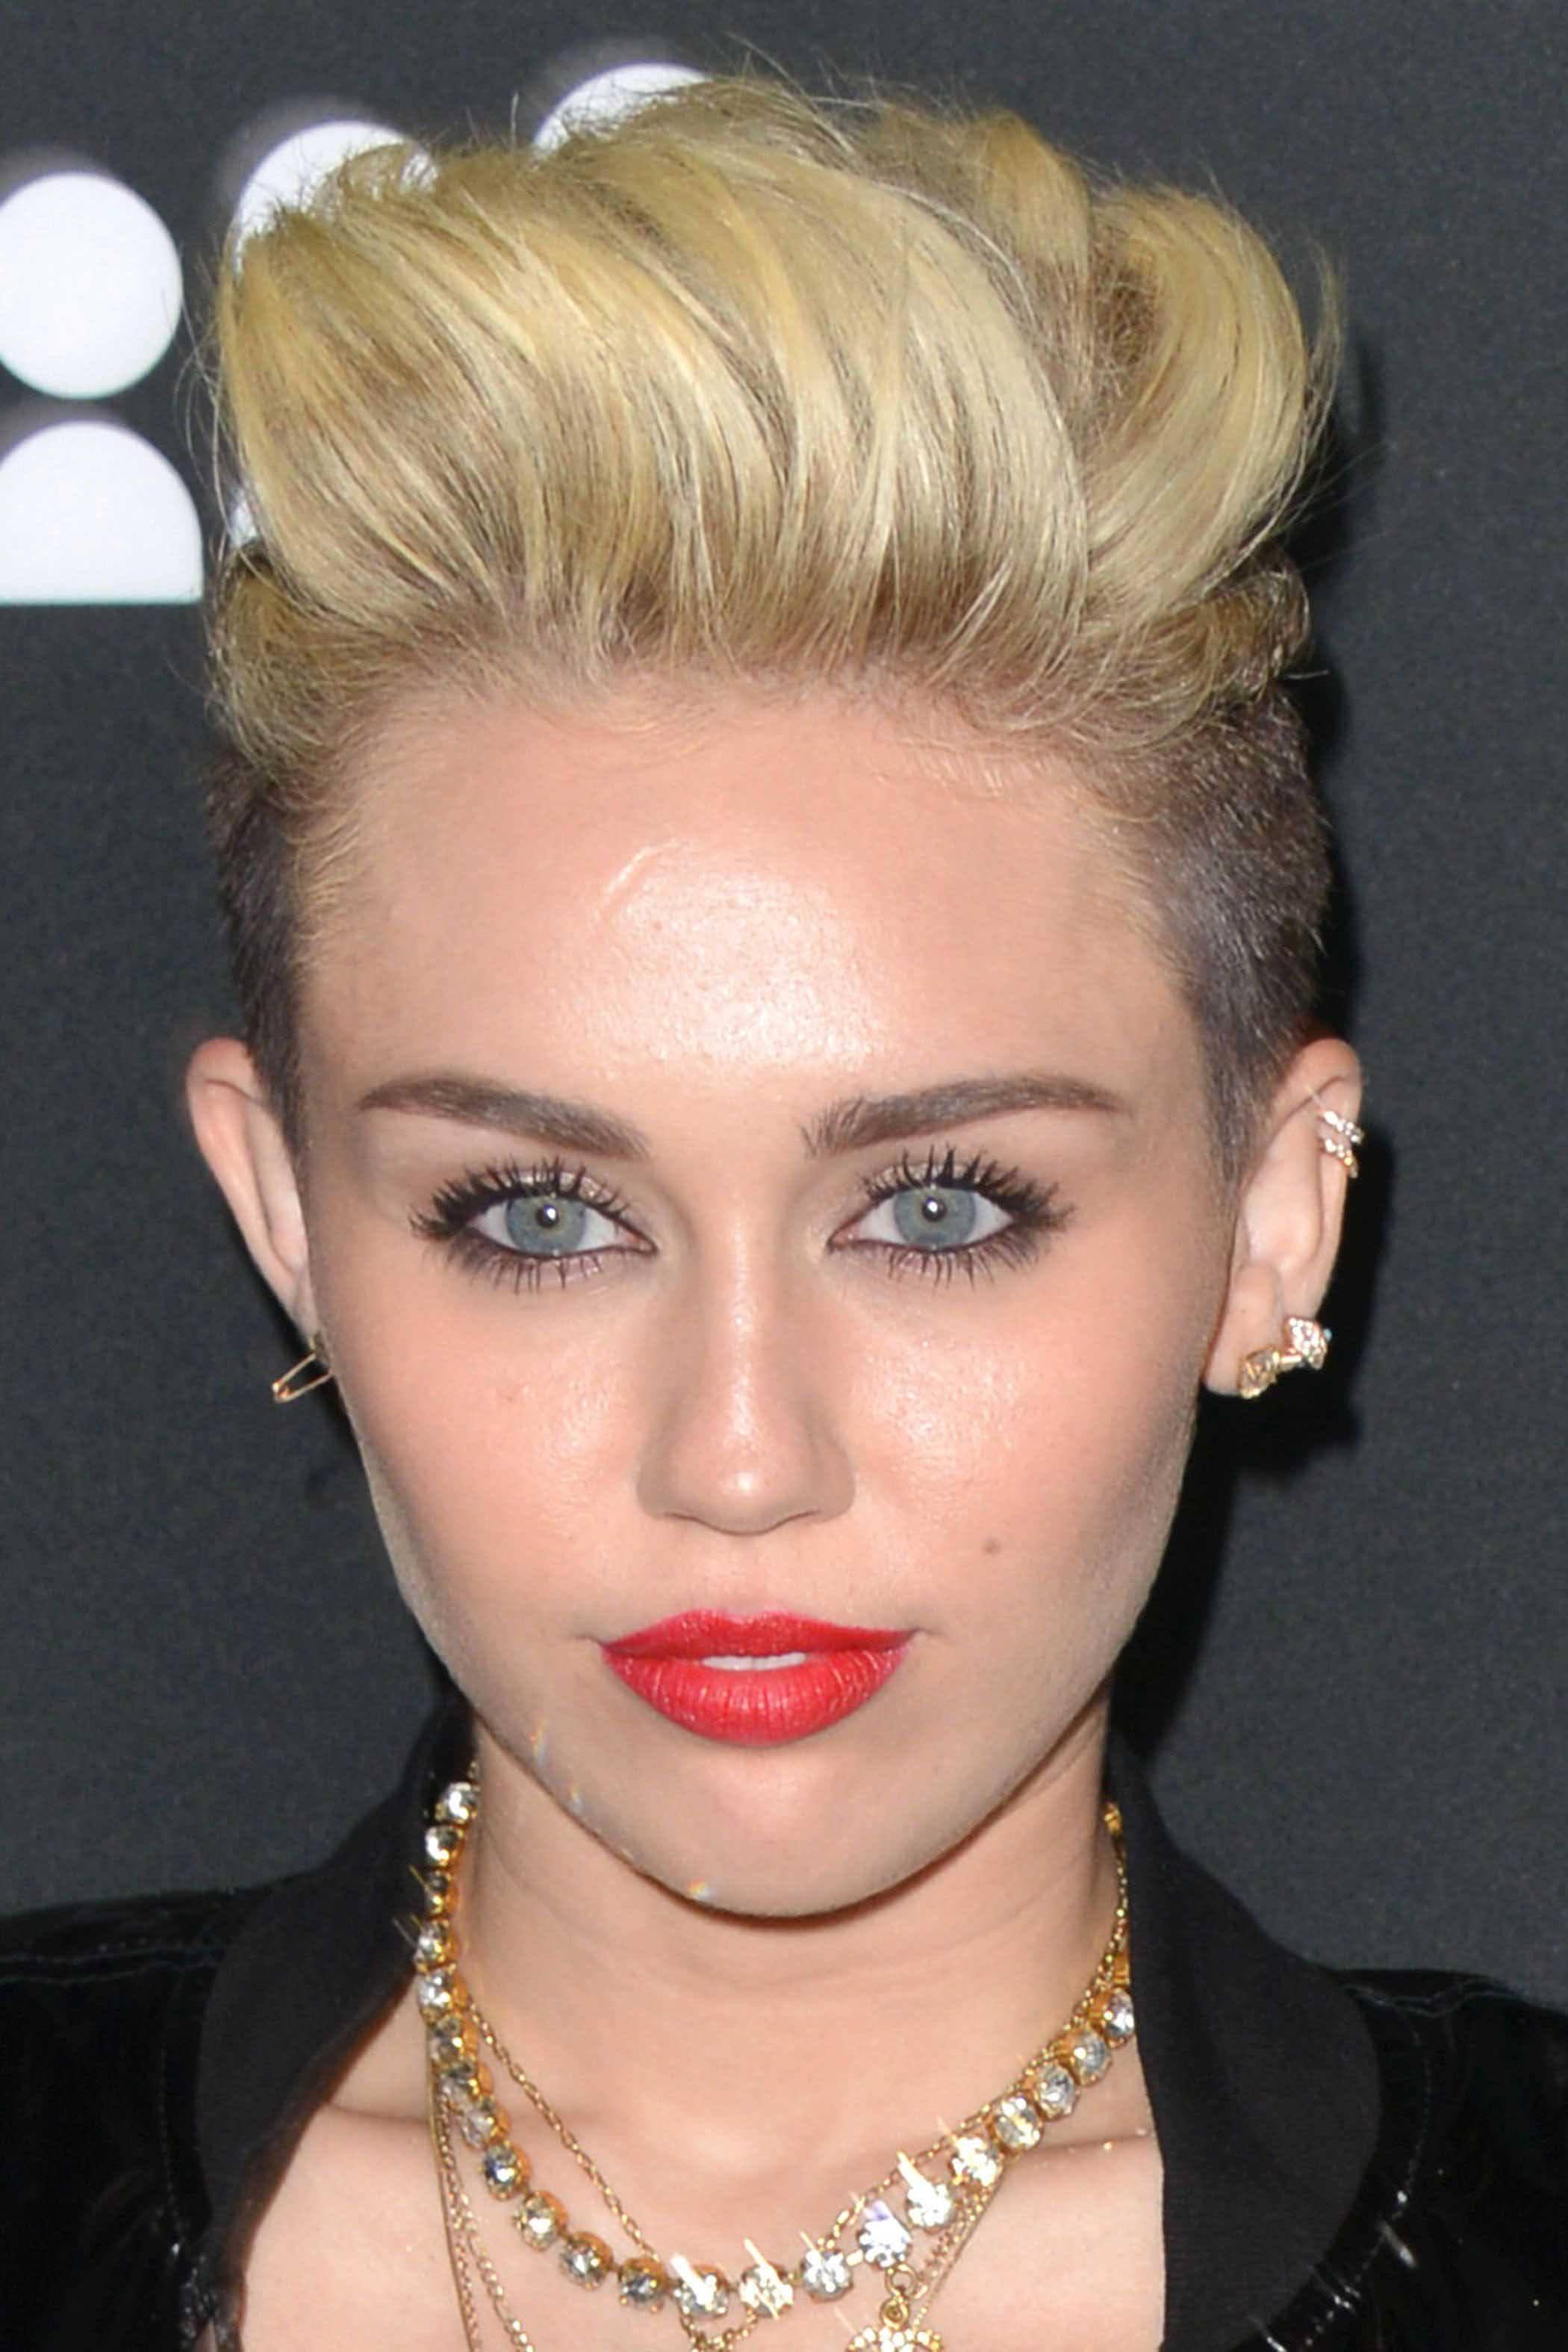 7 Women who are rocking short blonde hair